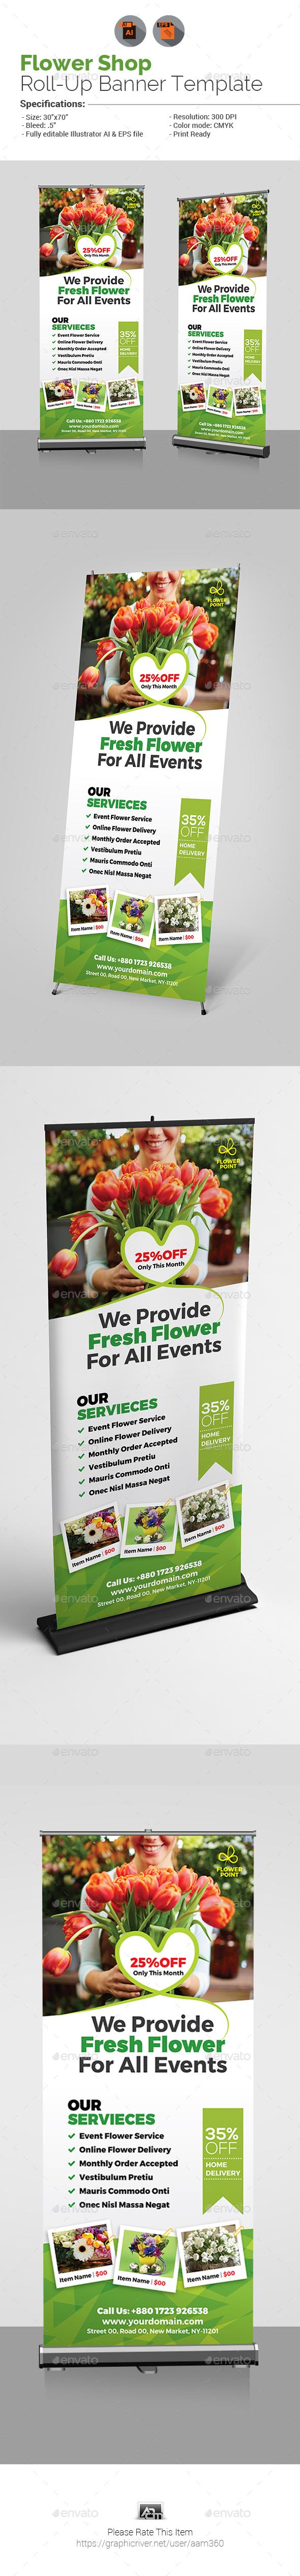 GraphicRiver Flower Shop Billboard Template 20543492